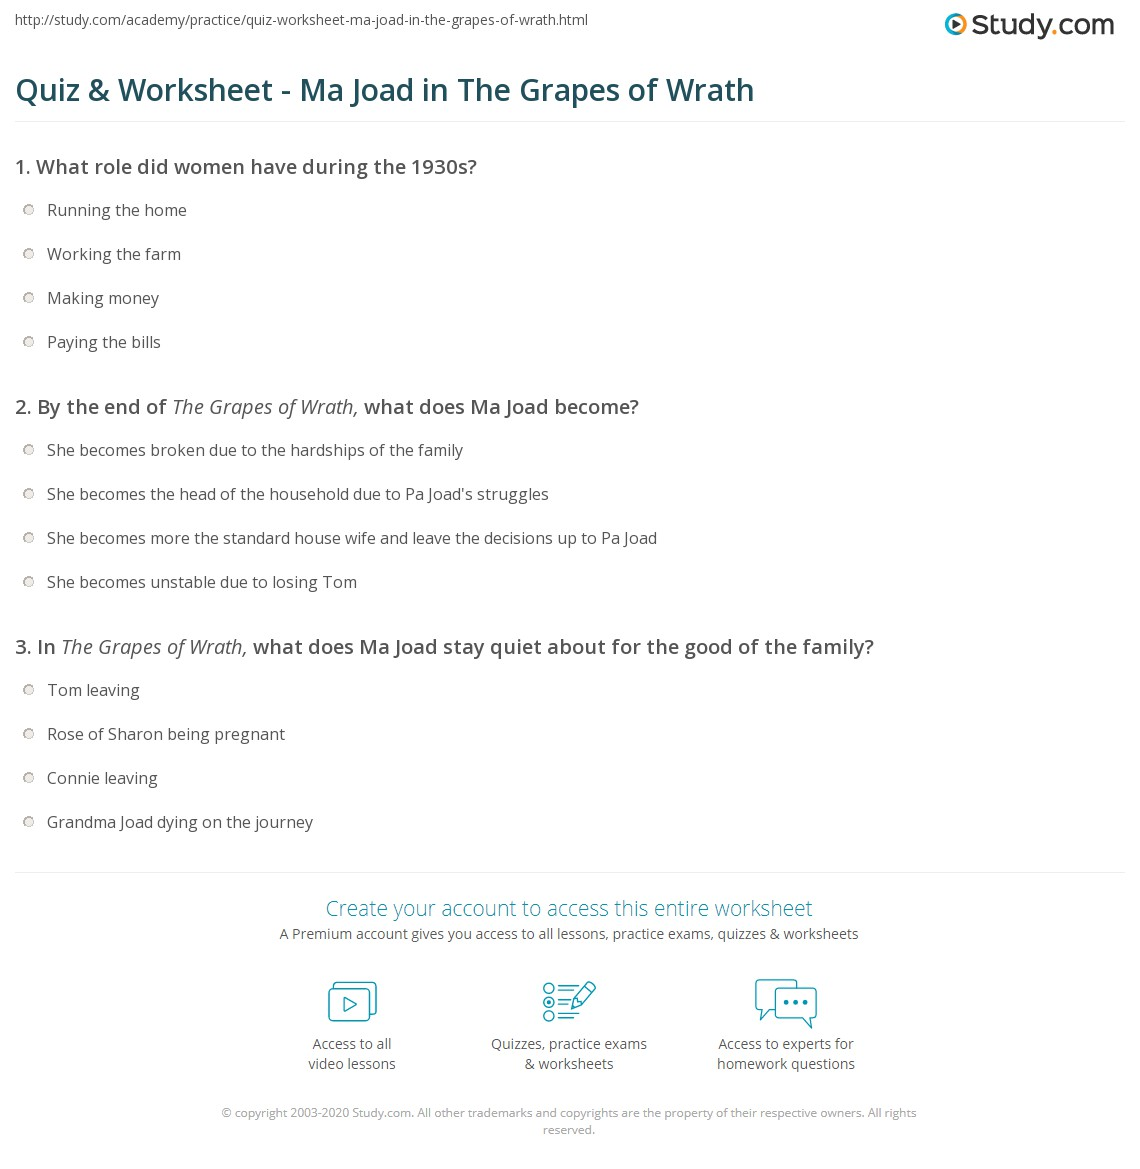 grapes of wrath analysis essay